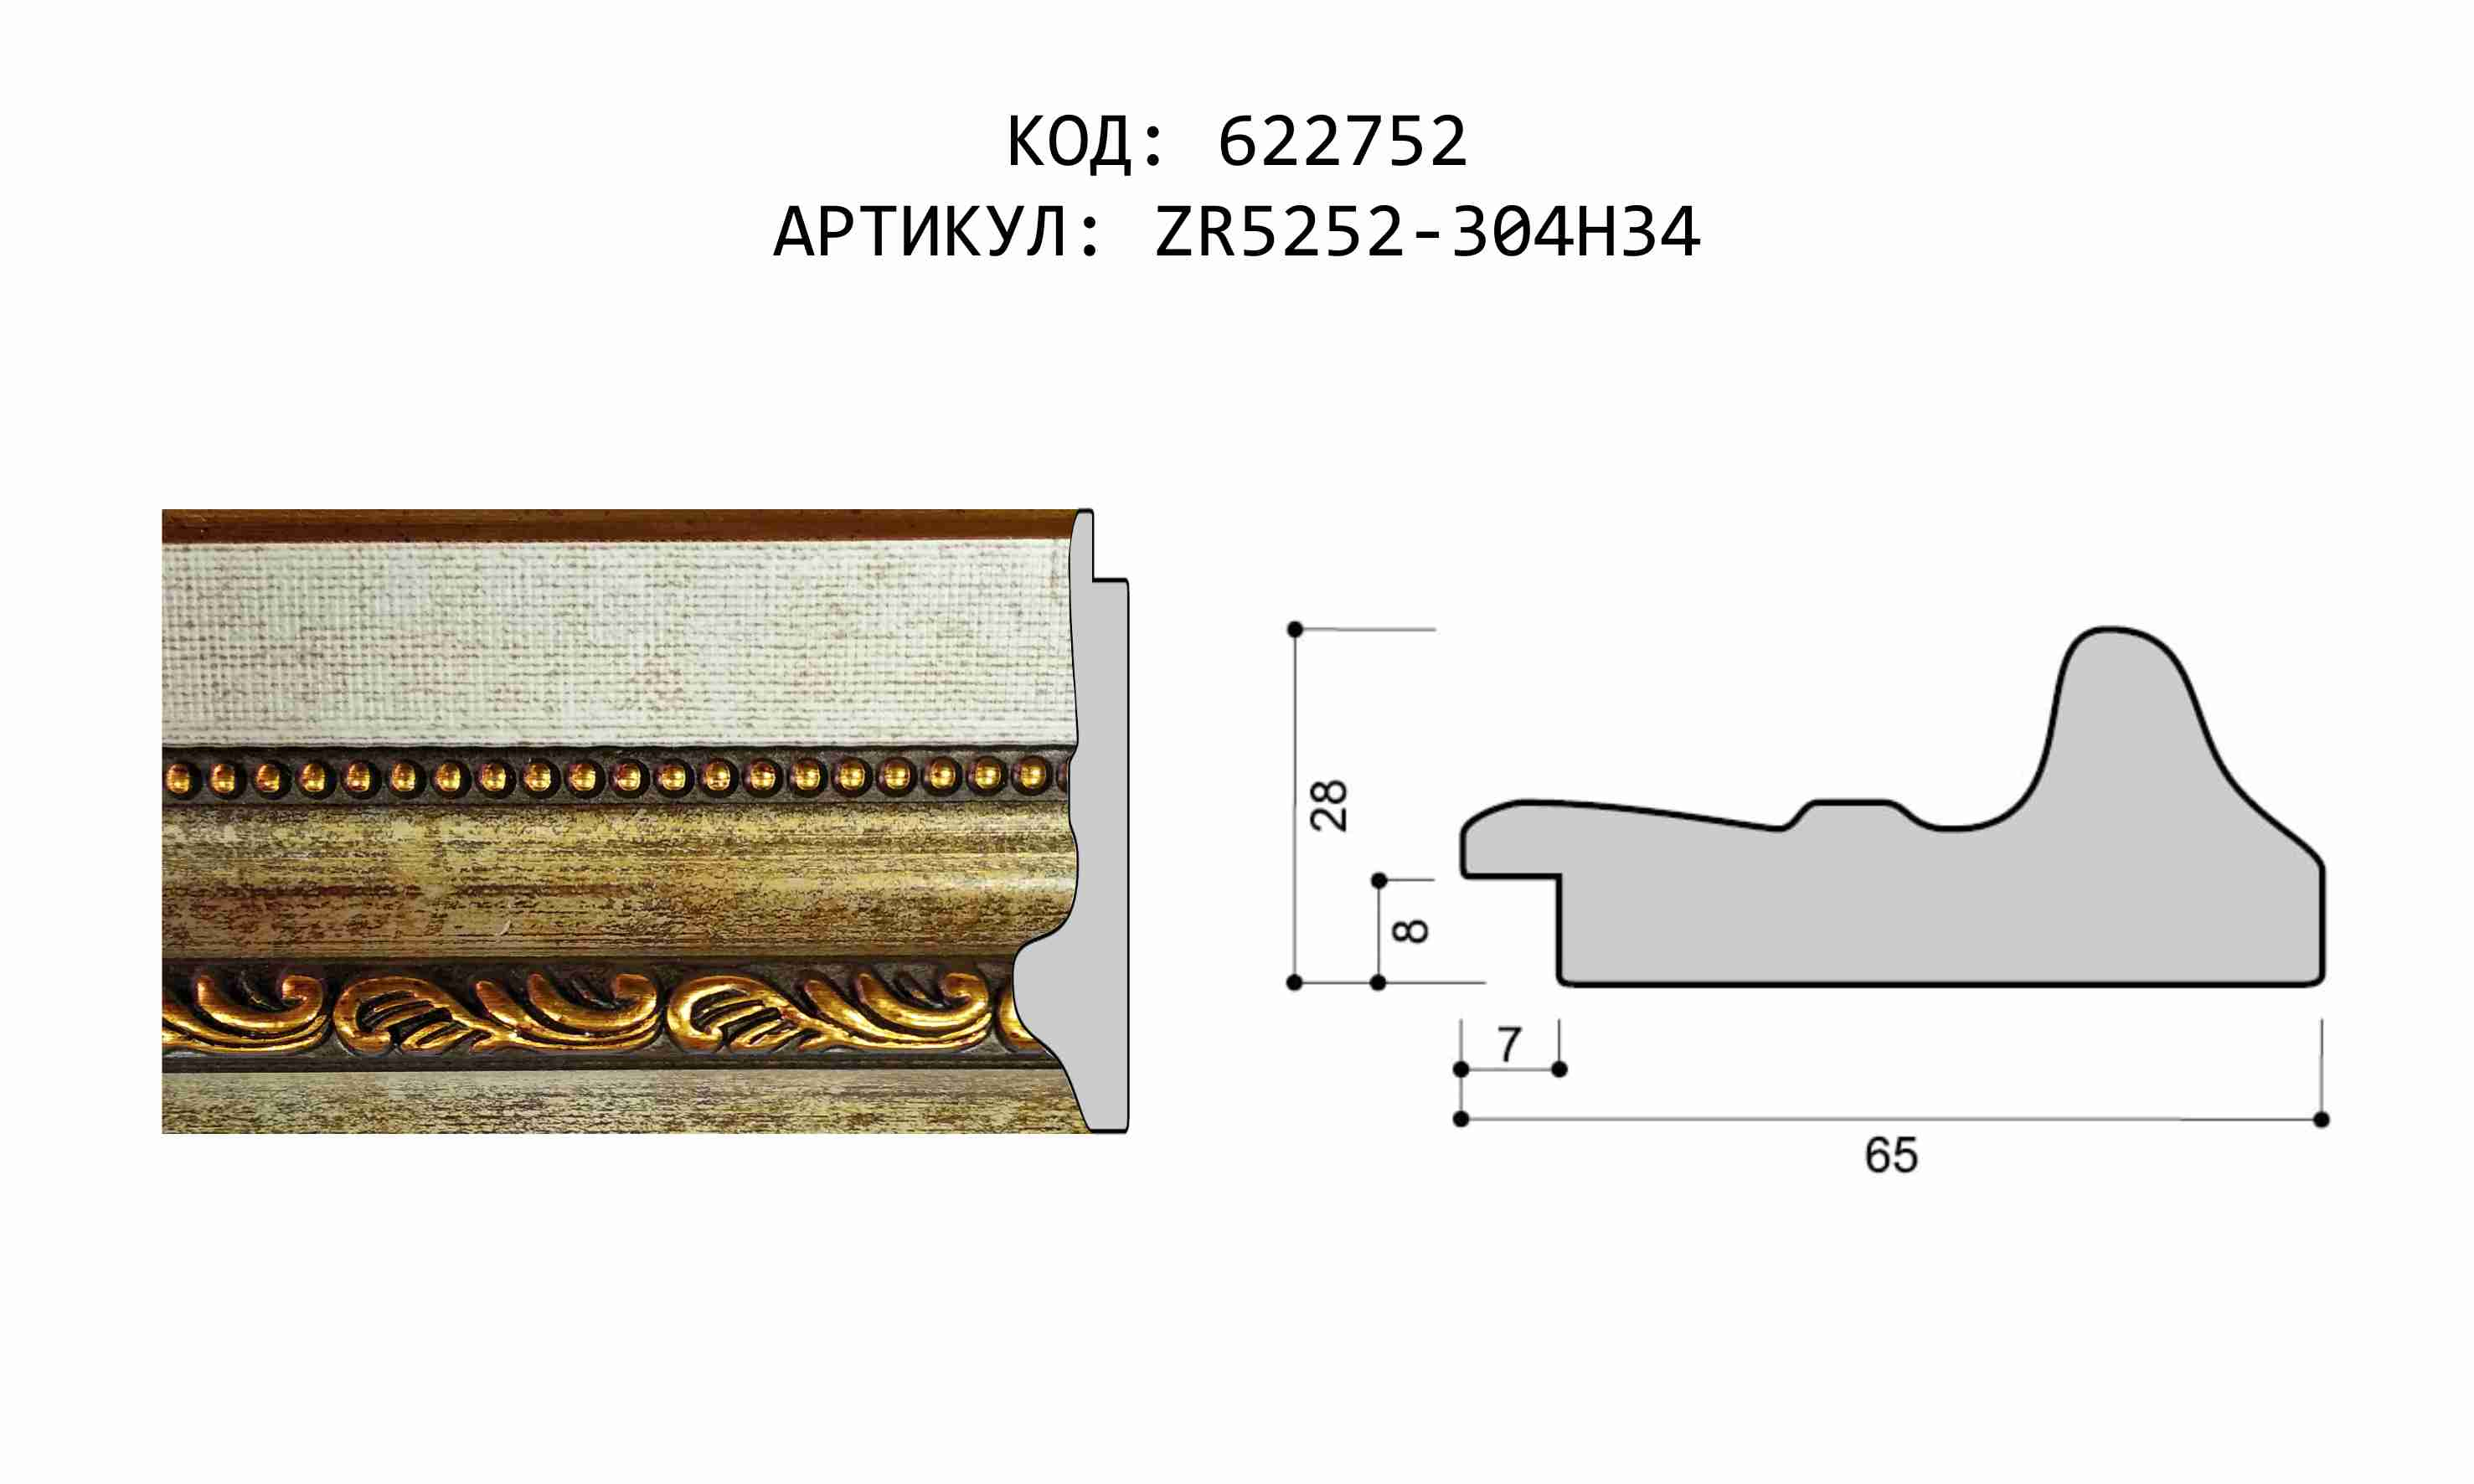 Артикул: ZR5252-304H34